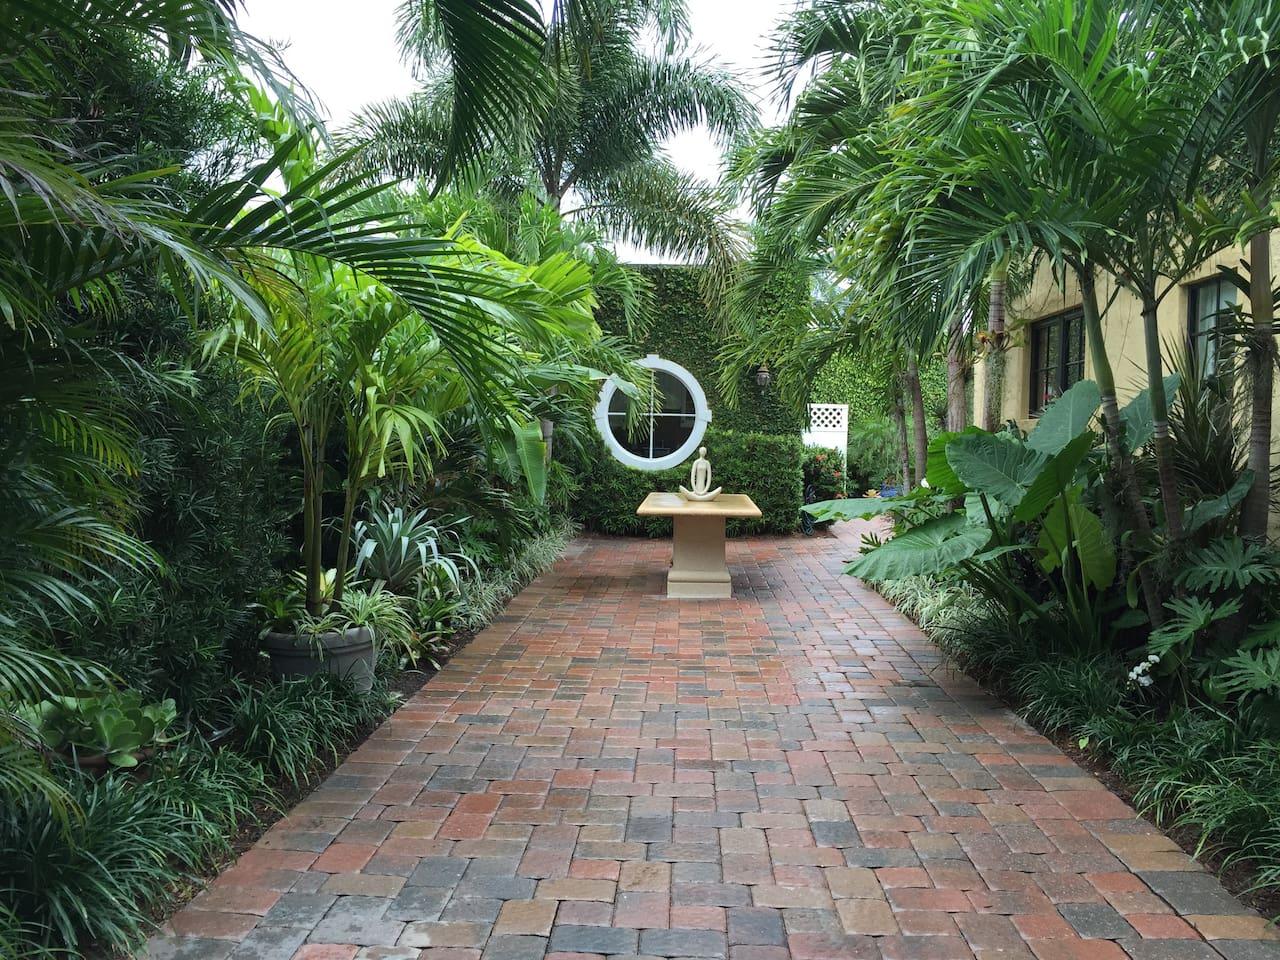 Garden area leads to Cabana